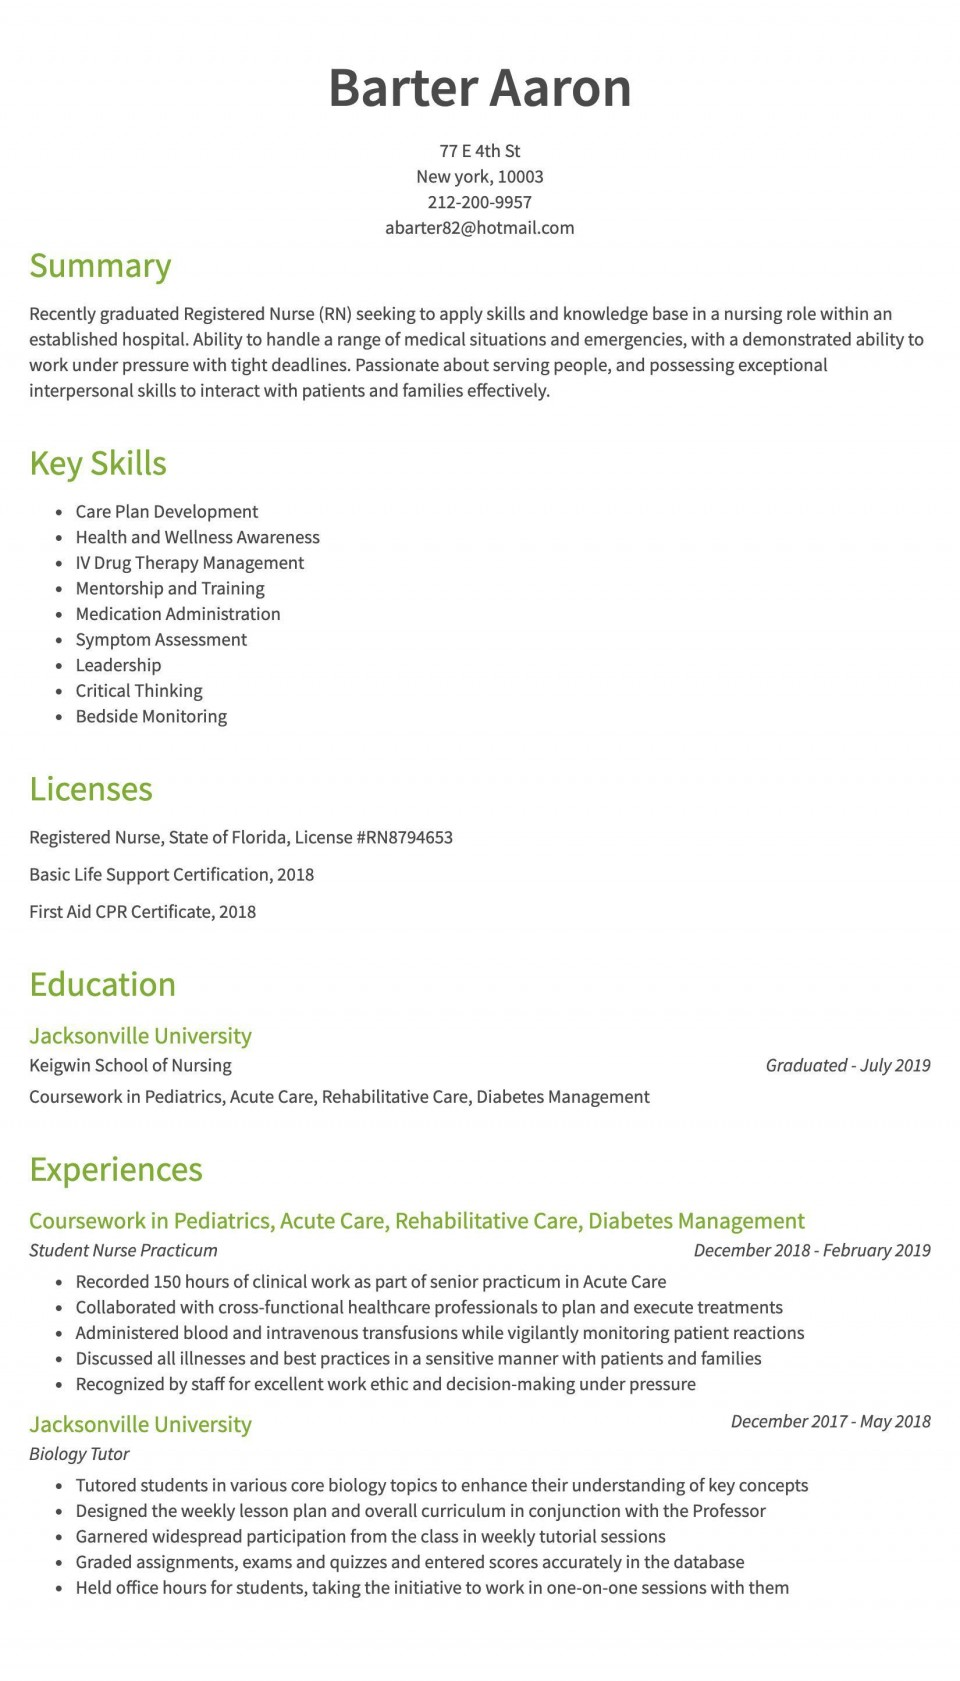 008 Remarkable Rn Graduate Resume Template High Resolution  New Grad Nurse960